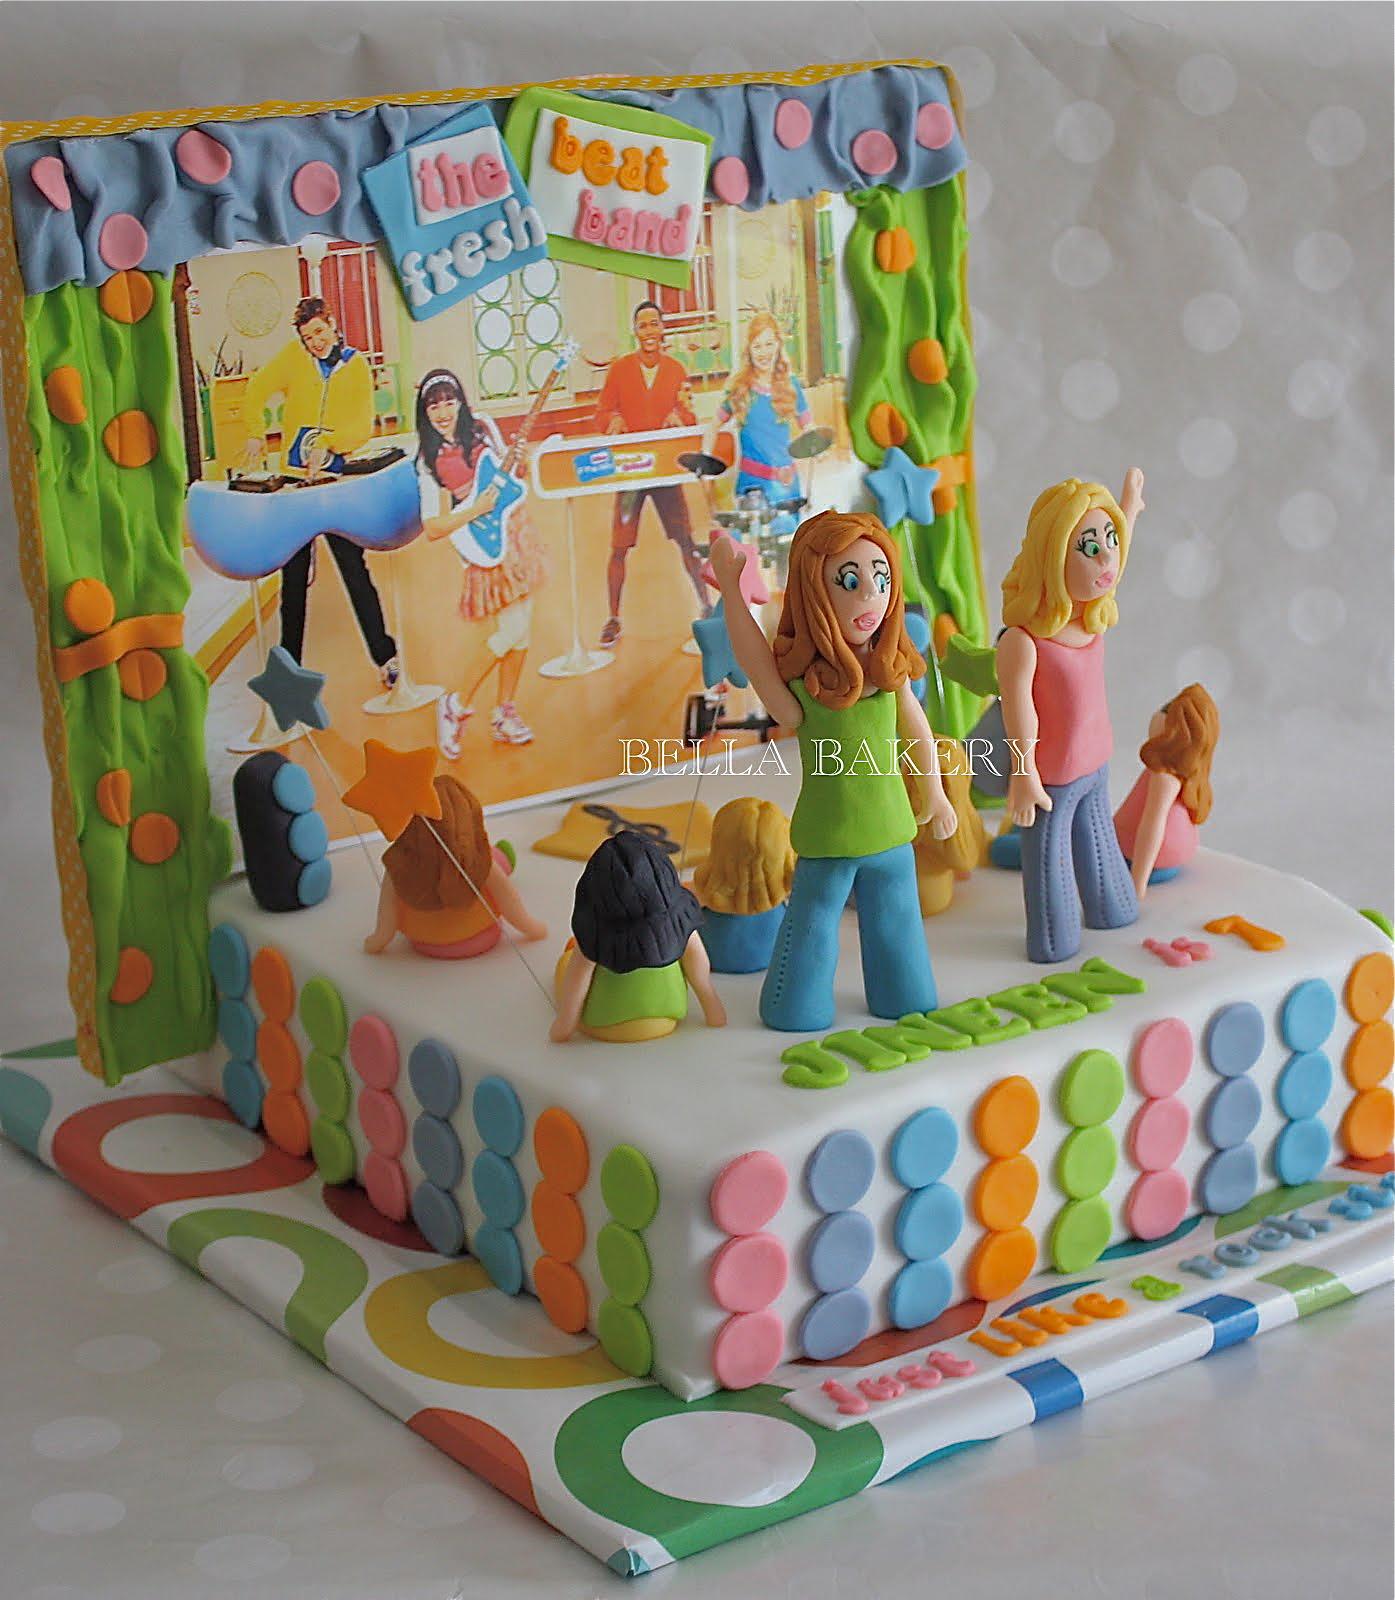 Birthday Party Venues In Dubai Children In Dubai Expat